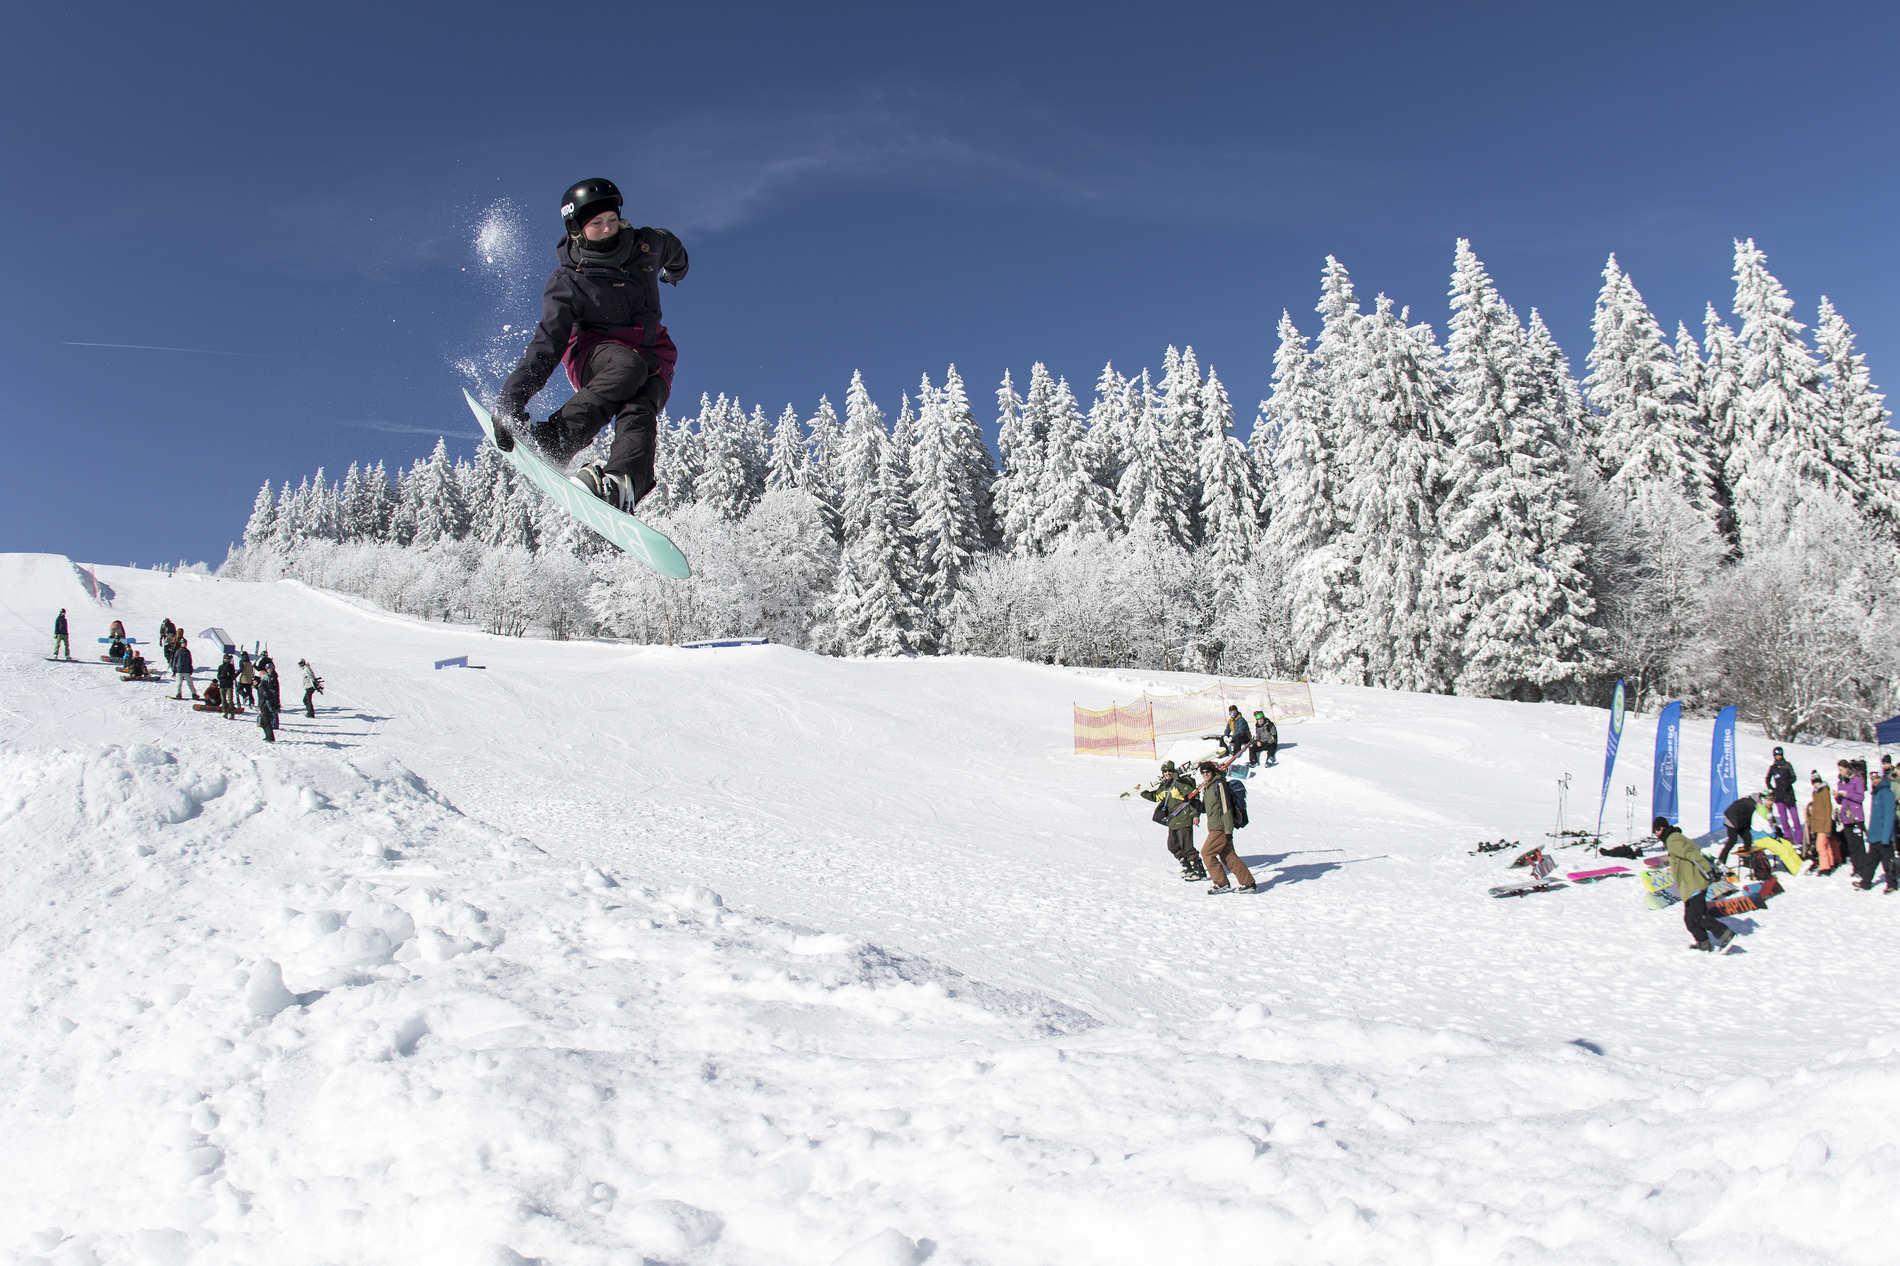 web snowpark feldberg 24 02 2018 action sb annika bartmann martin herrmann qparks 44